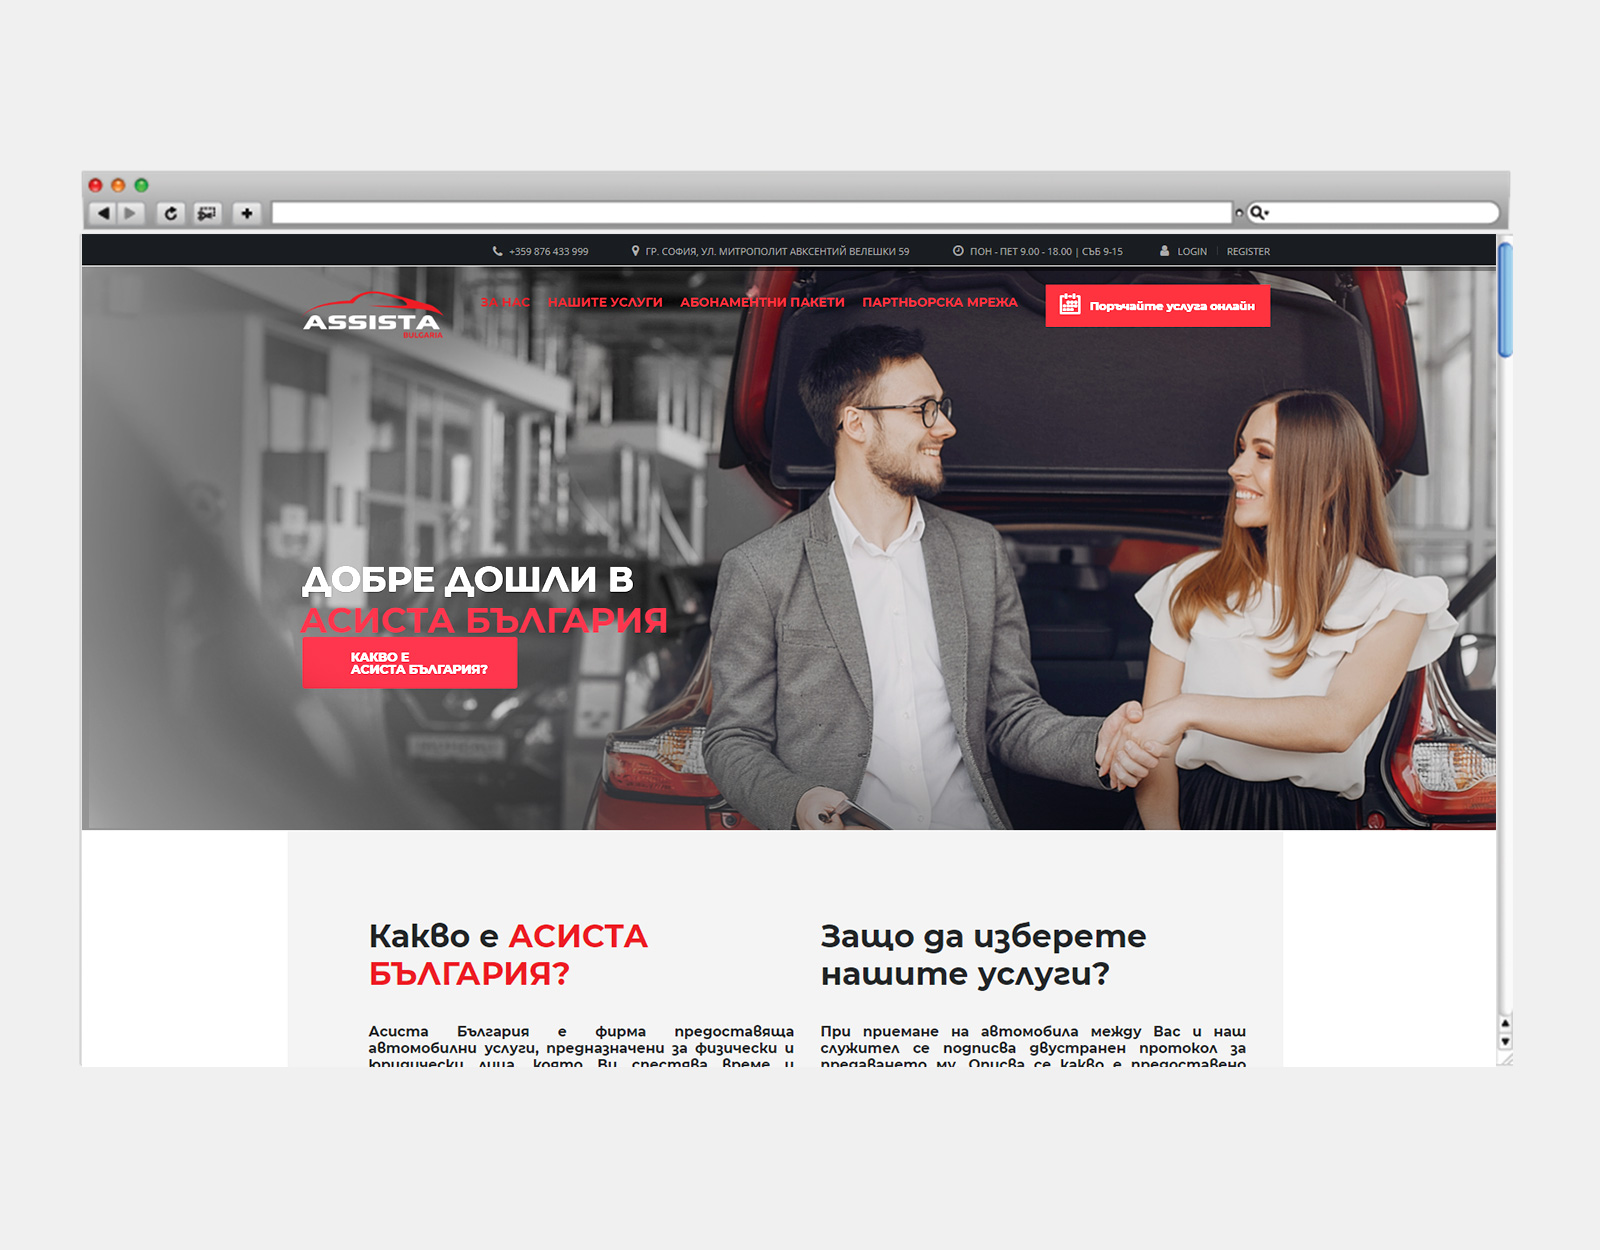 Уебсайт/ Assista